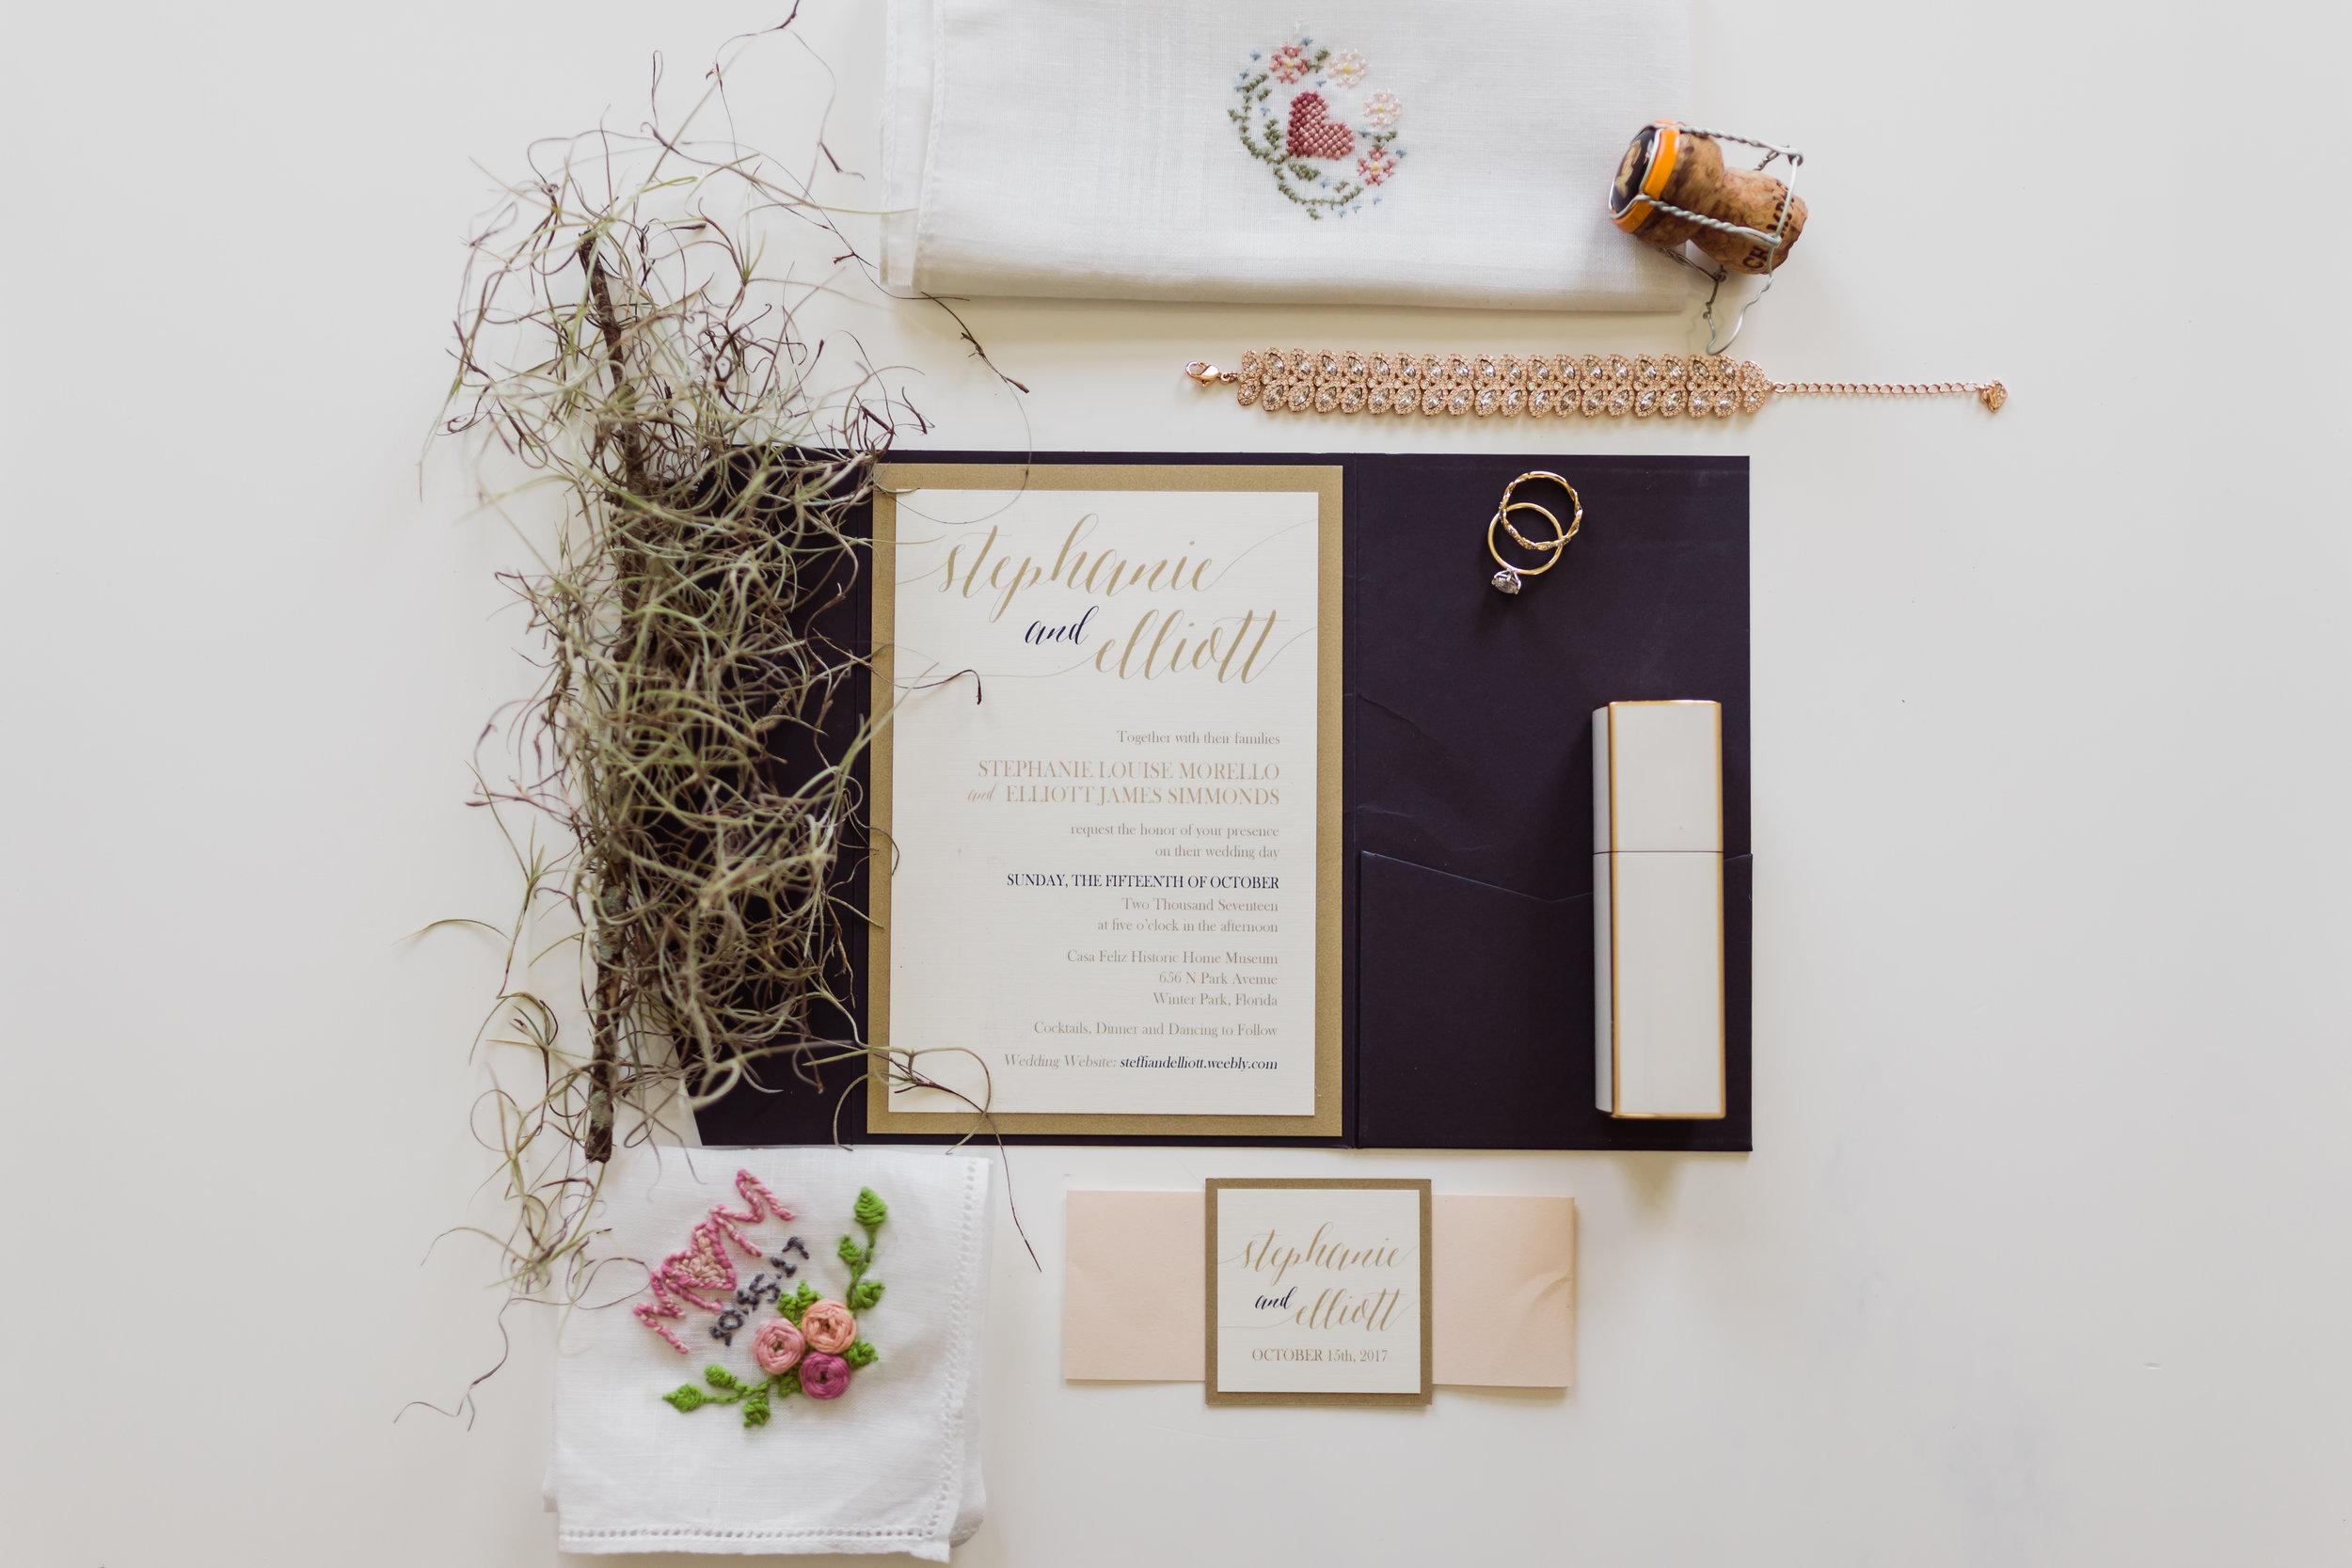 2017.10.15 Steffi and Elliott Simmonds Casa Feliz Wedding (9 of 969).jpg